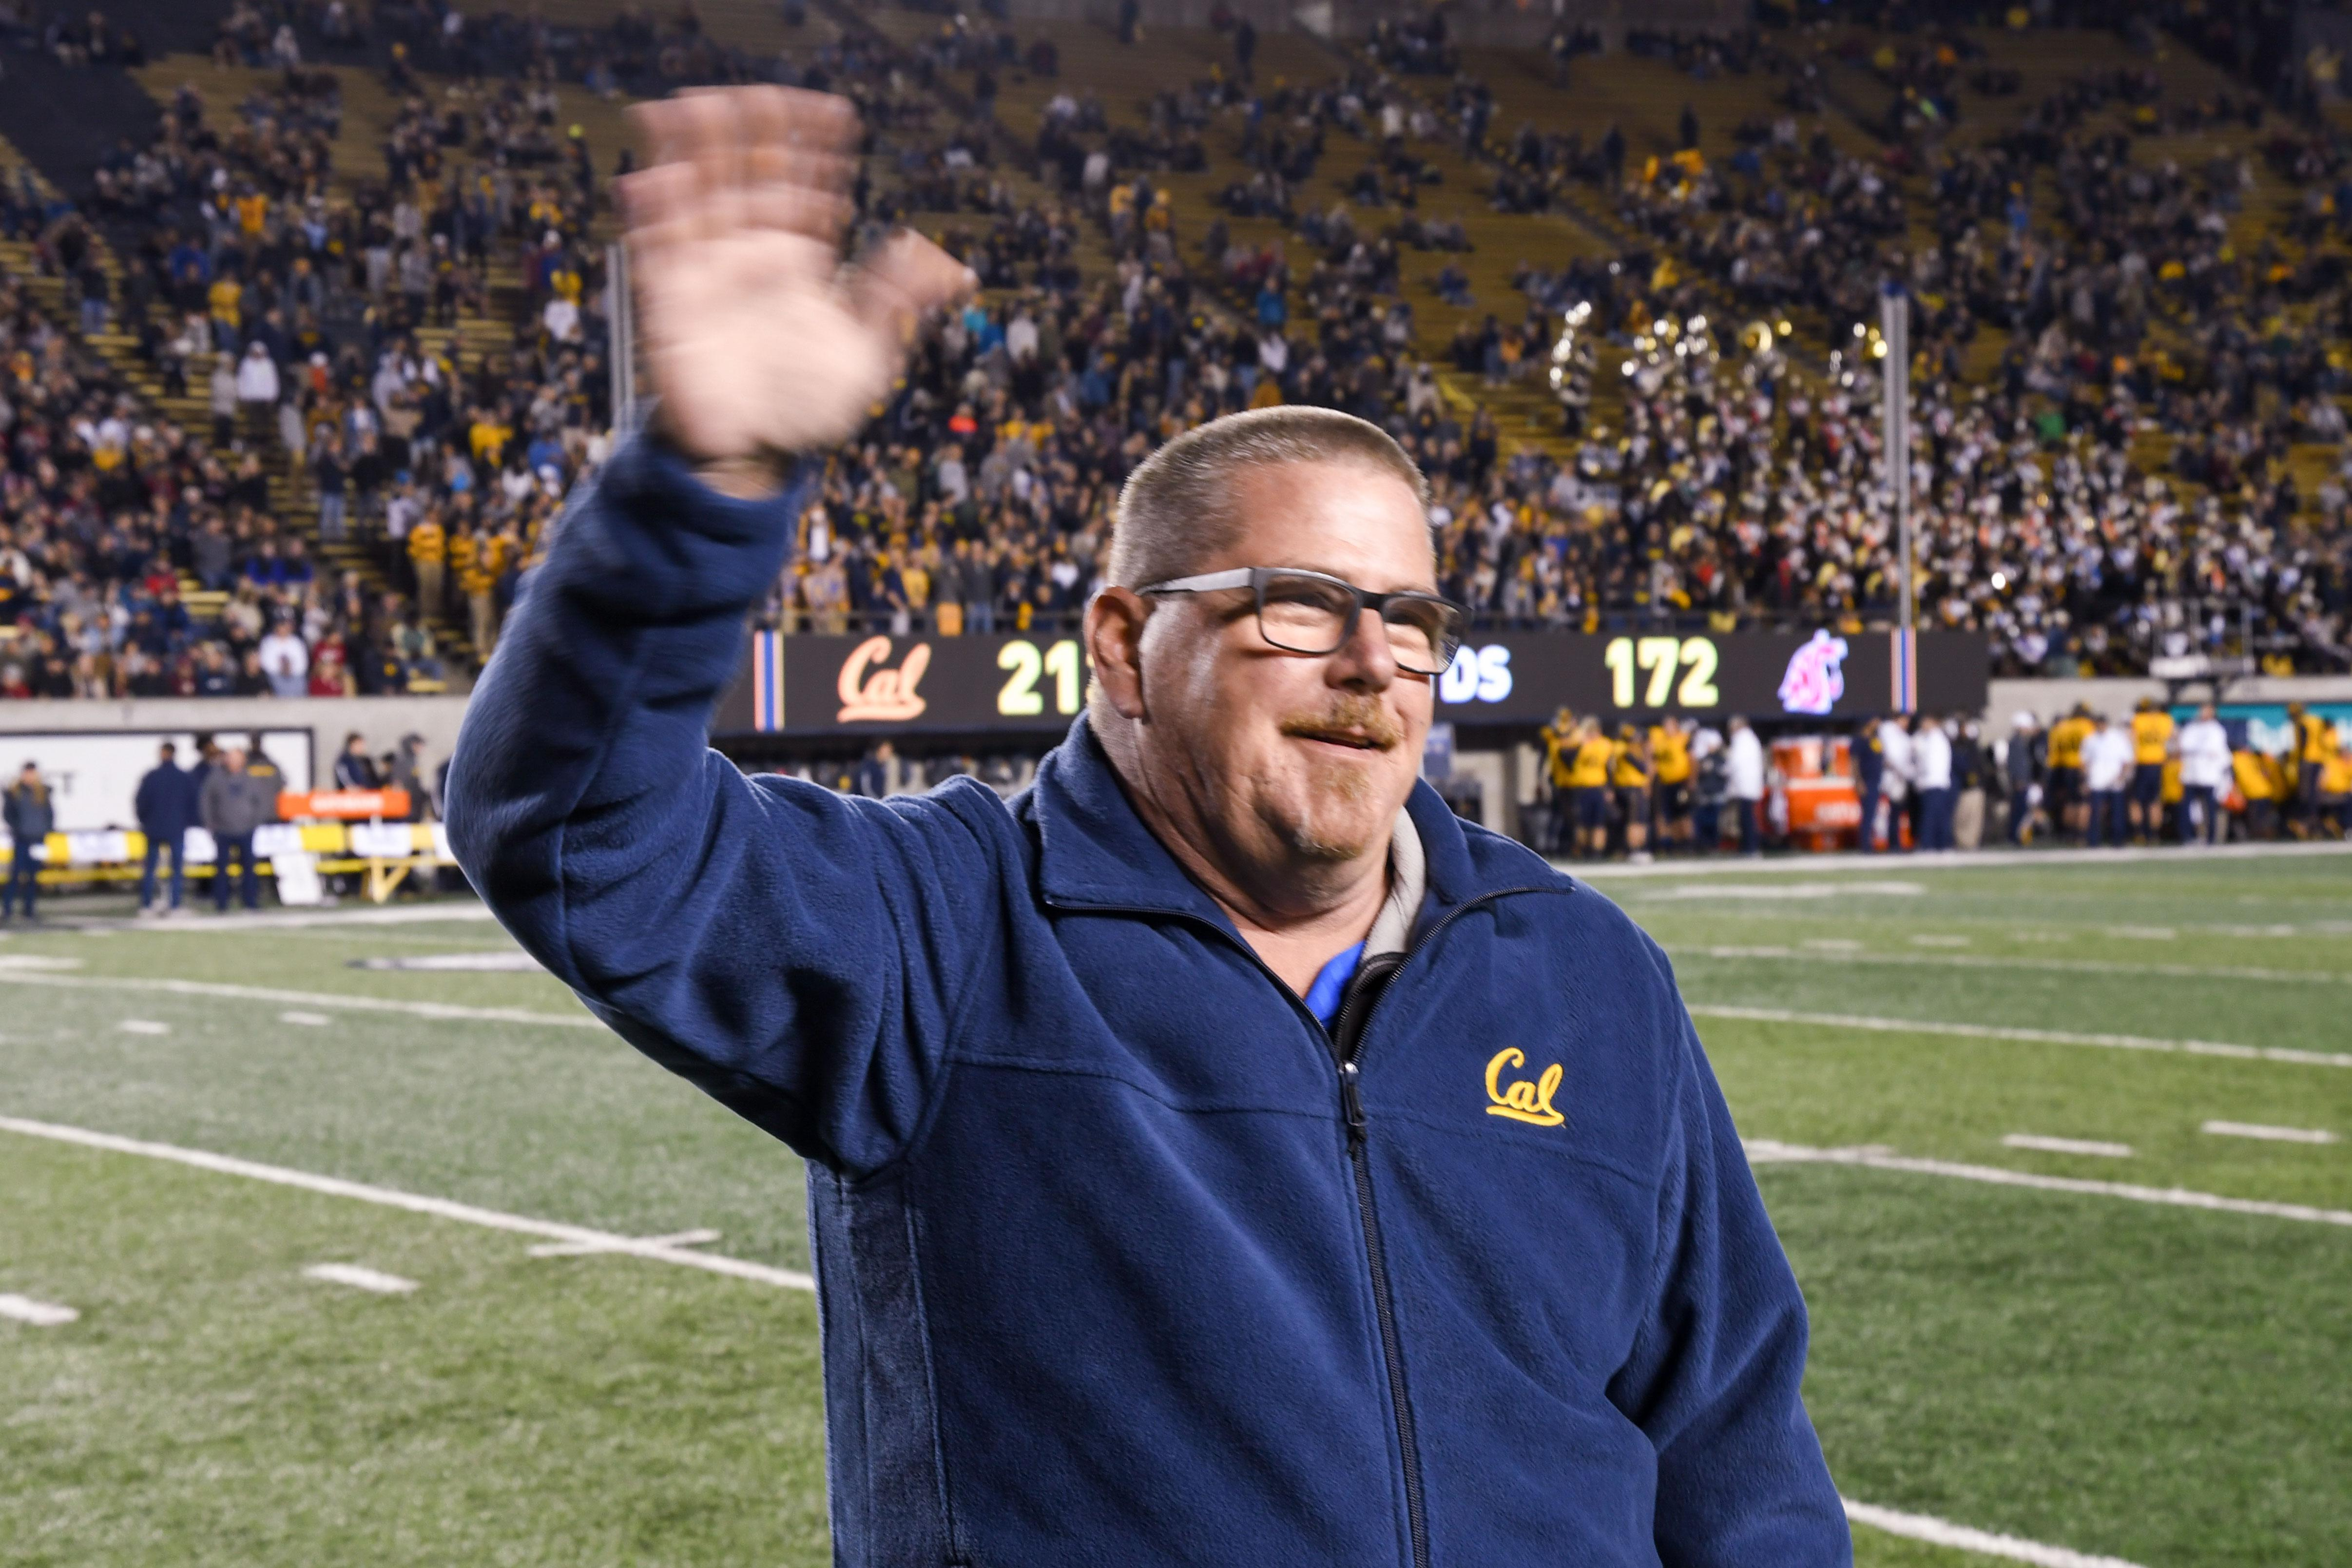 Local 3993 member John O'Connor honored at Cal football game